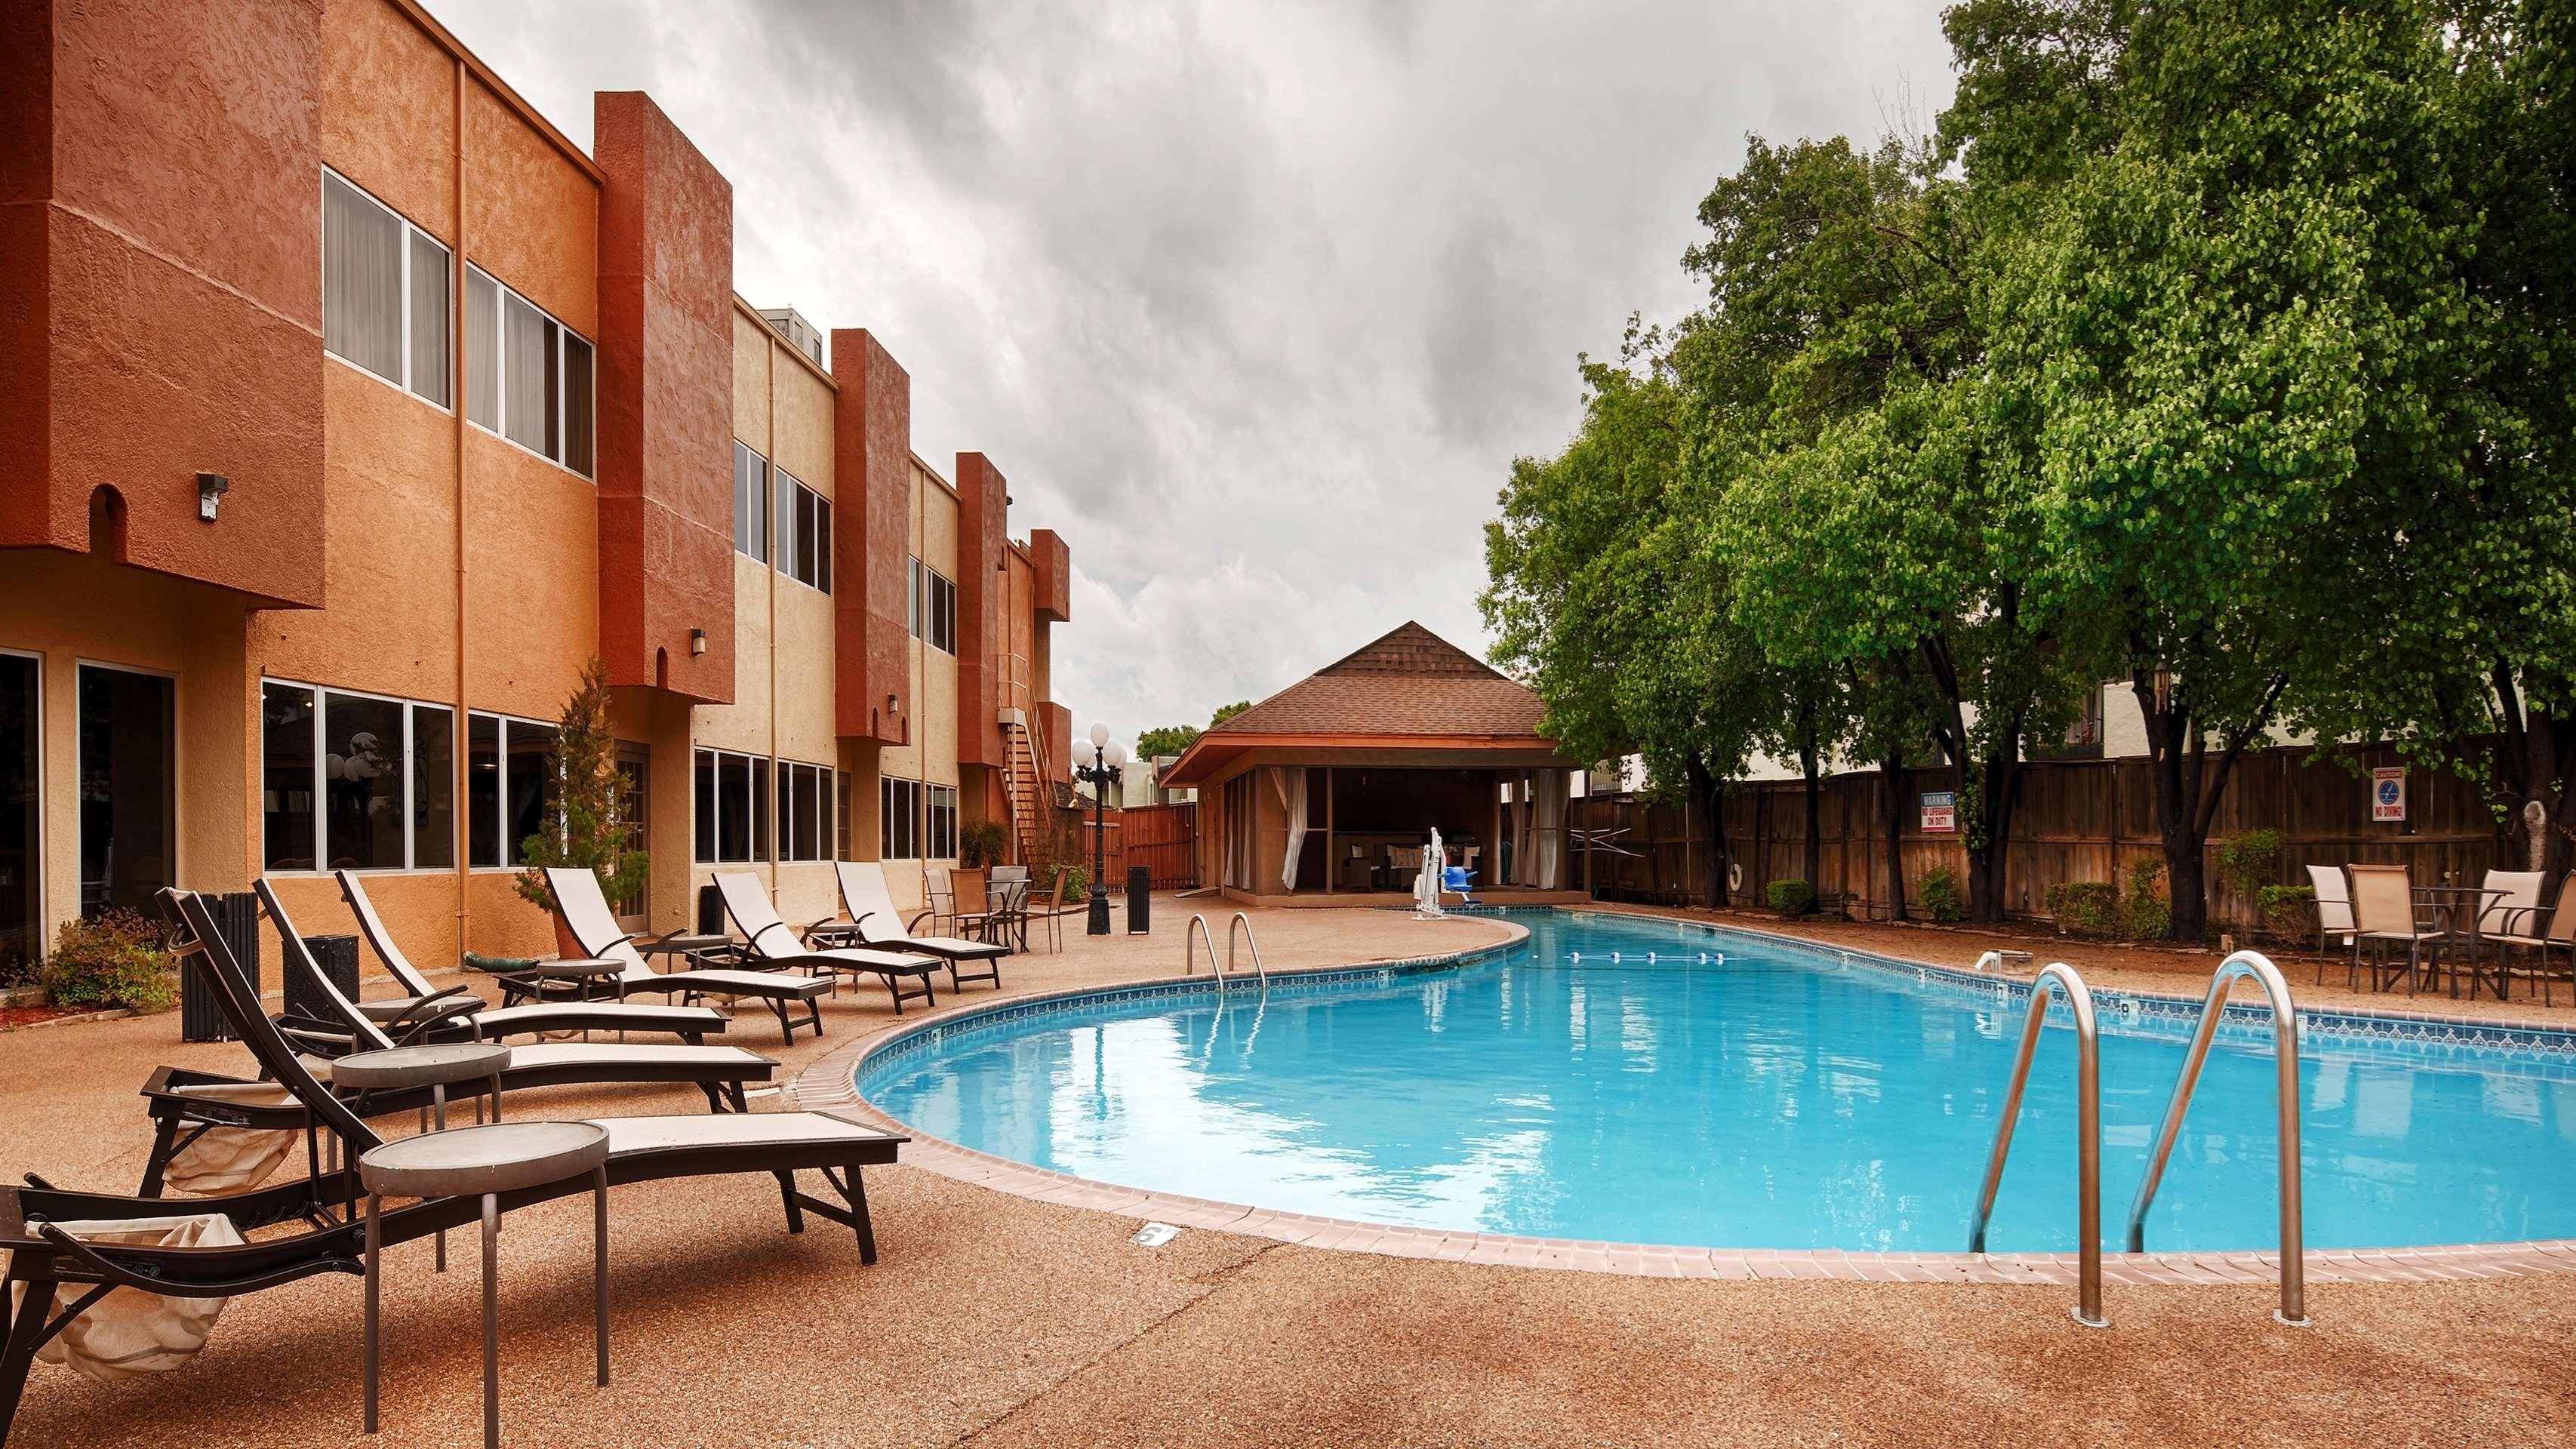 Best Western Plus Lawton Hotel & Convention Center image 7